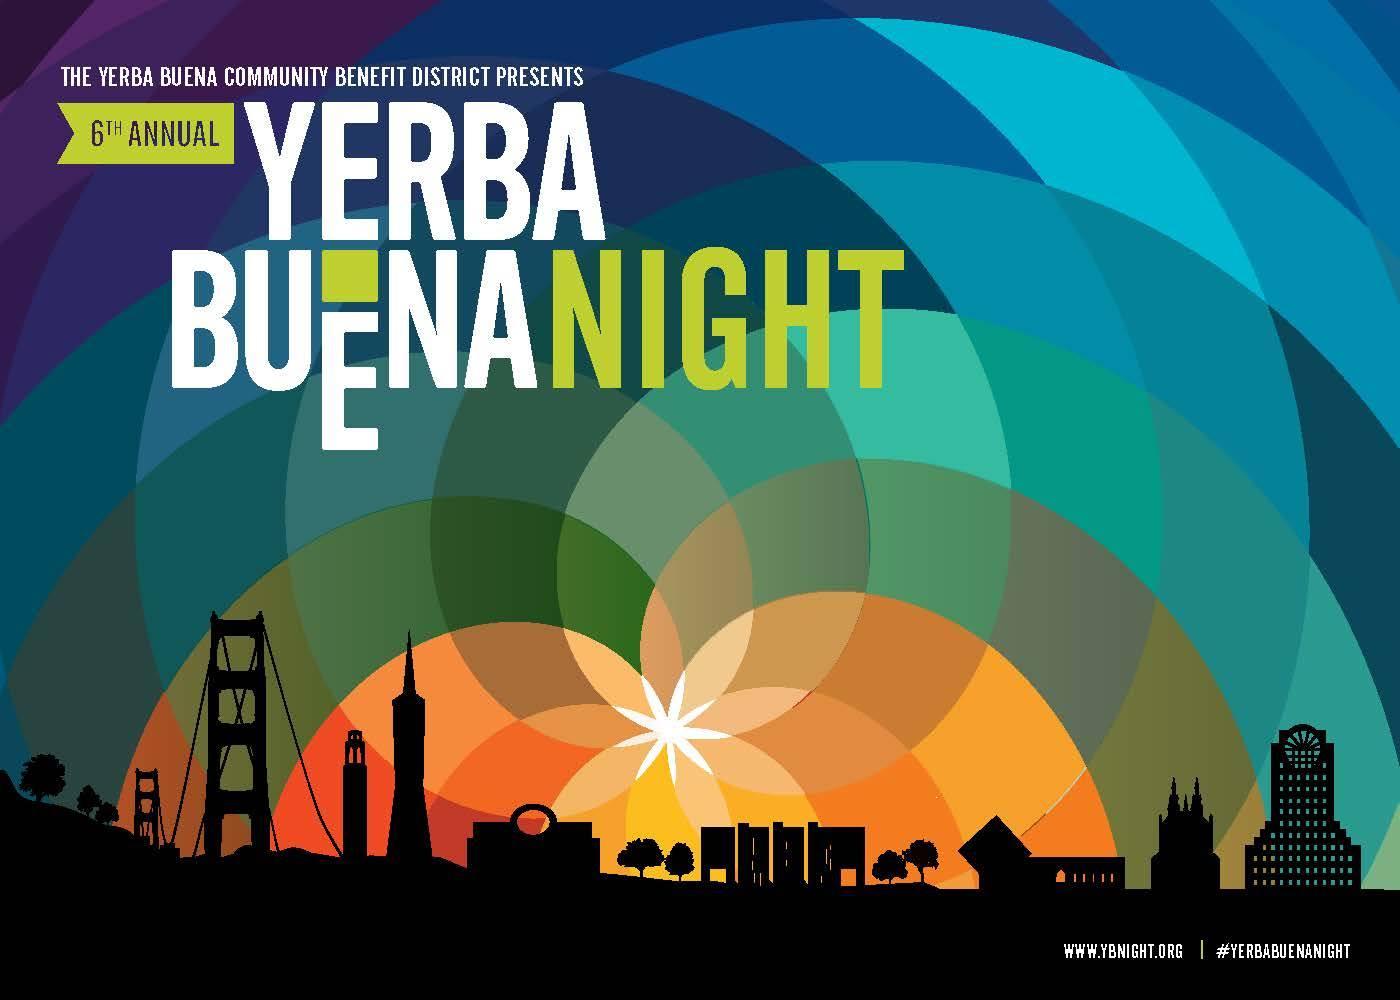 Image Courtesy: Yerba Buena Community Benefit District